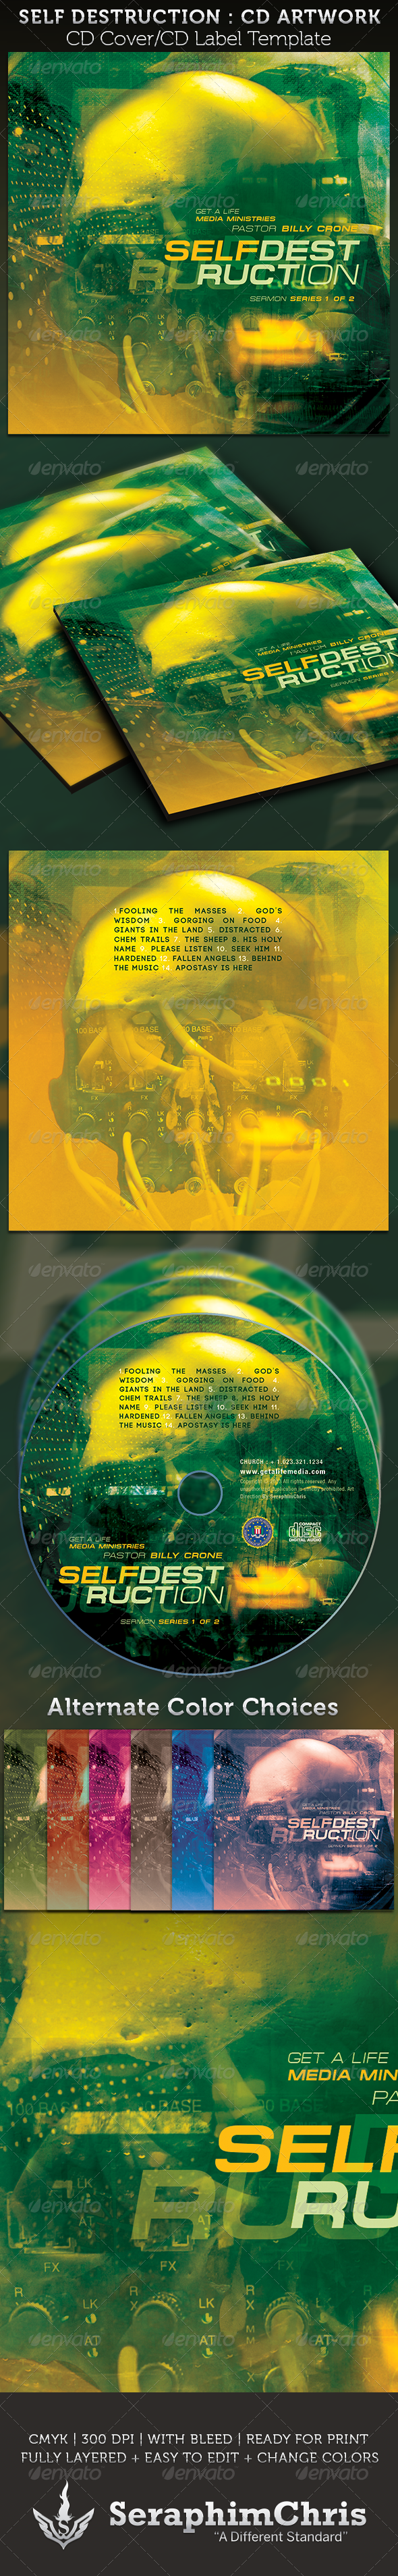 GraphicRiver Self Destruction CD Cover Artwork Template 3856941